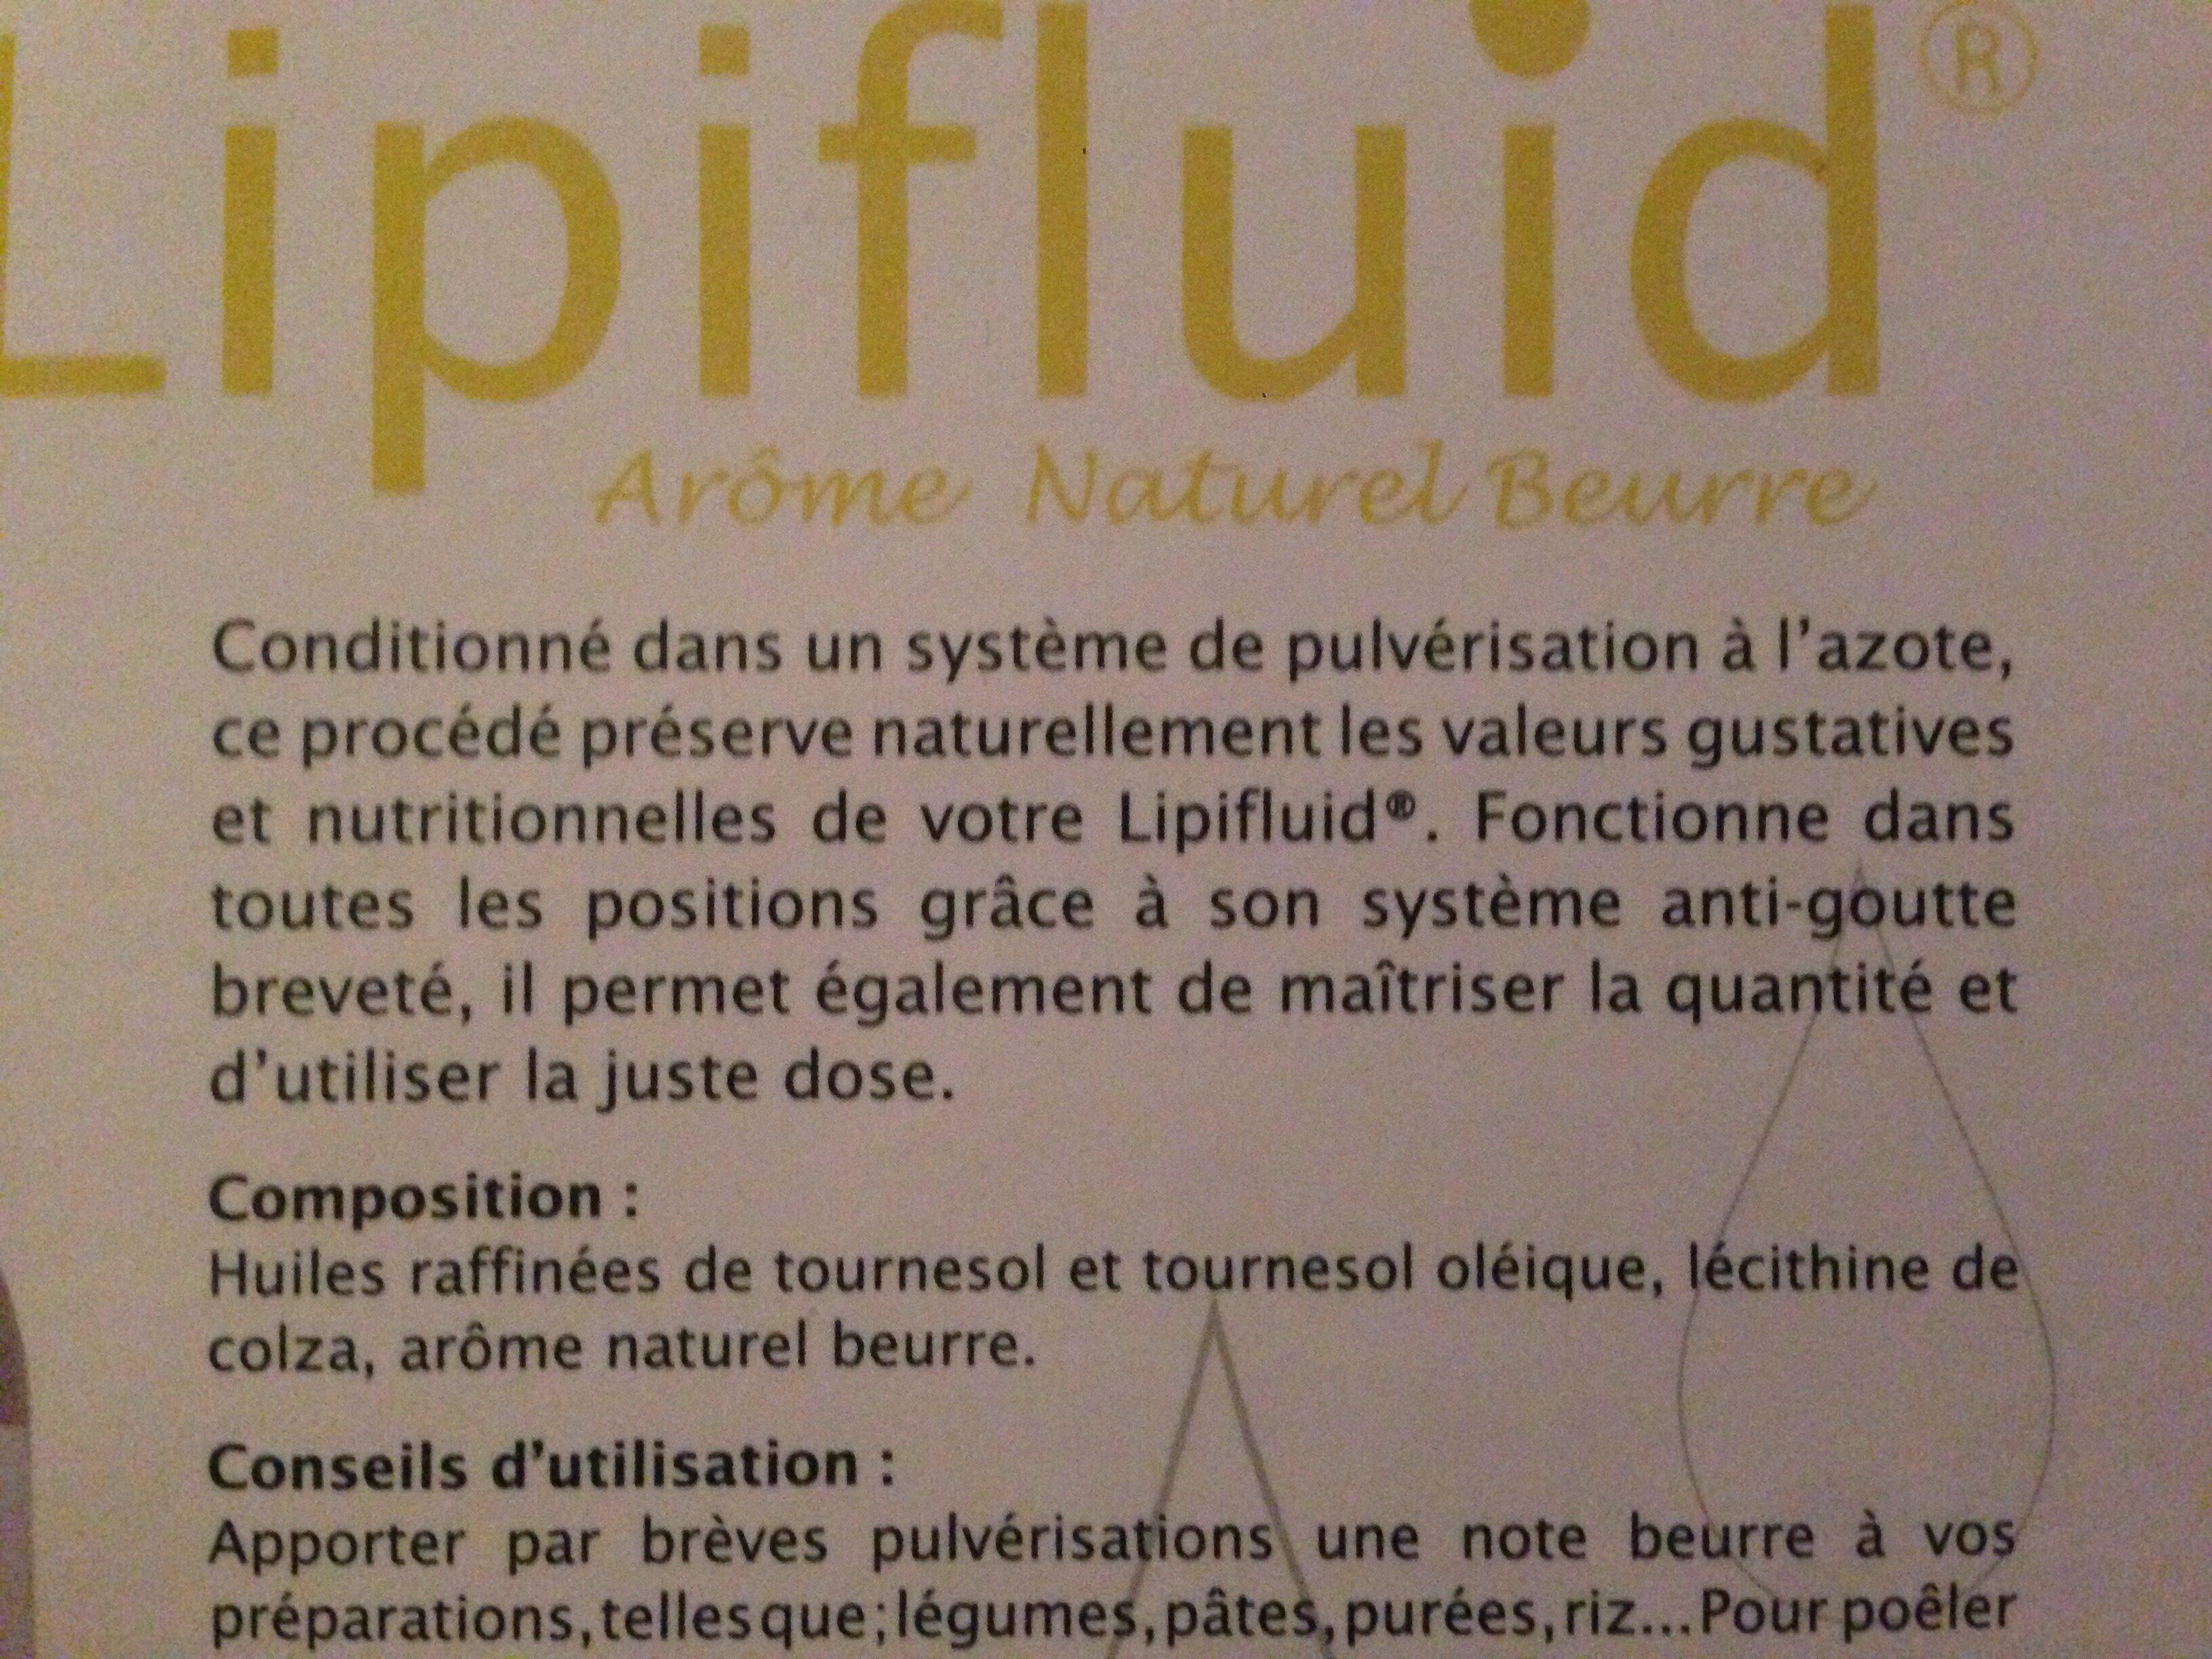 Lipifluid Arôme Naturel Beurre - 300 ML - Ingrediënten